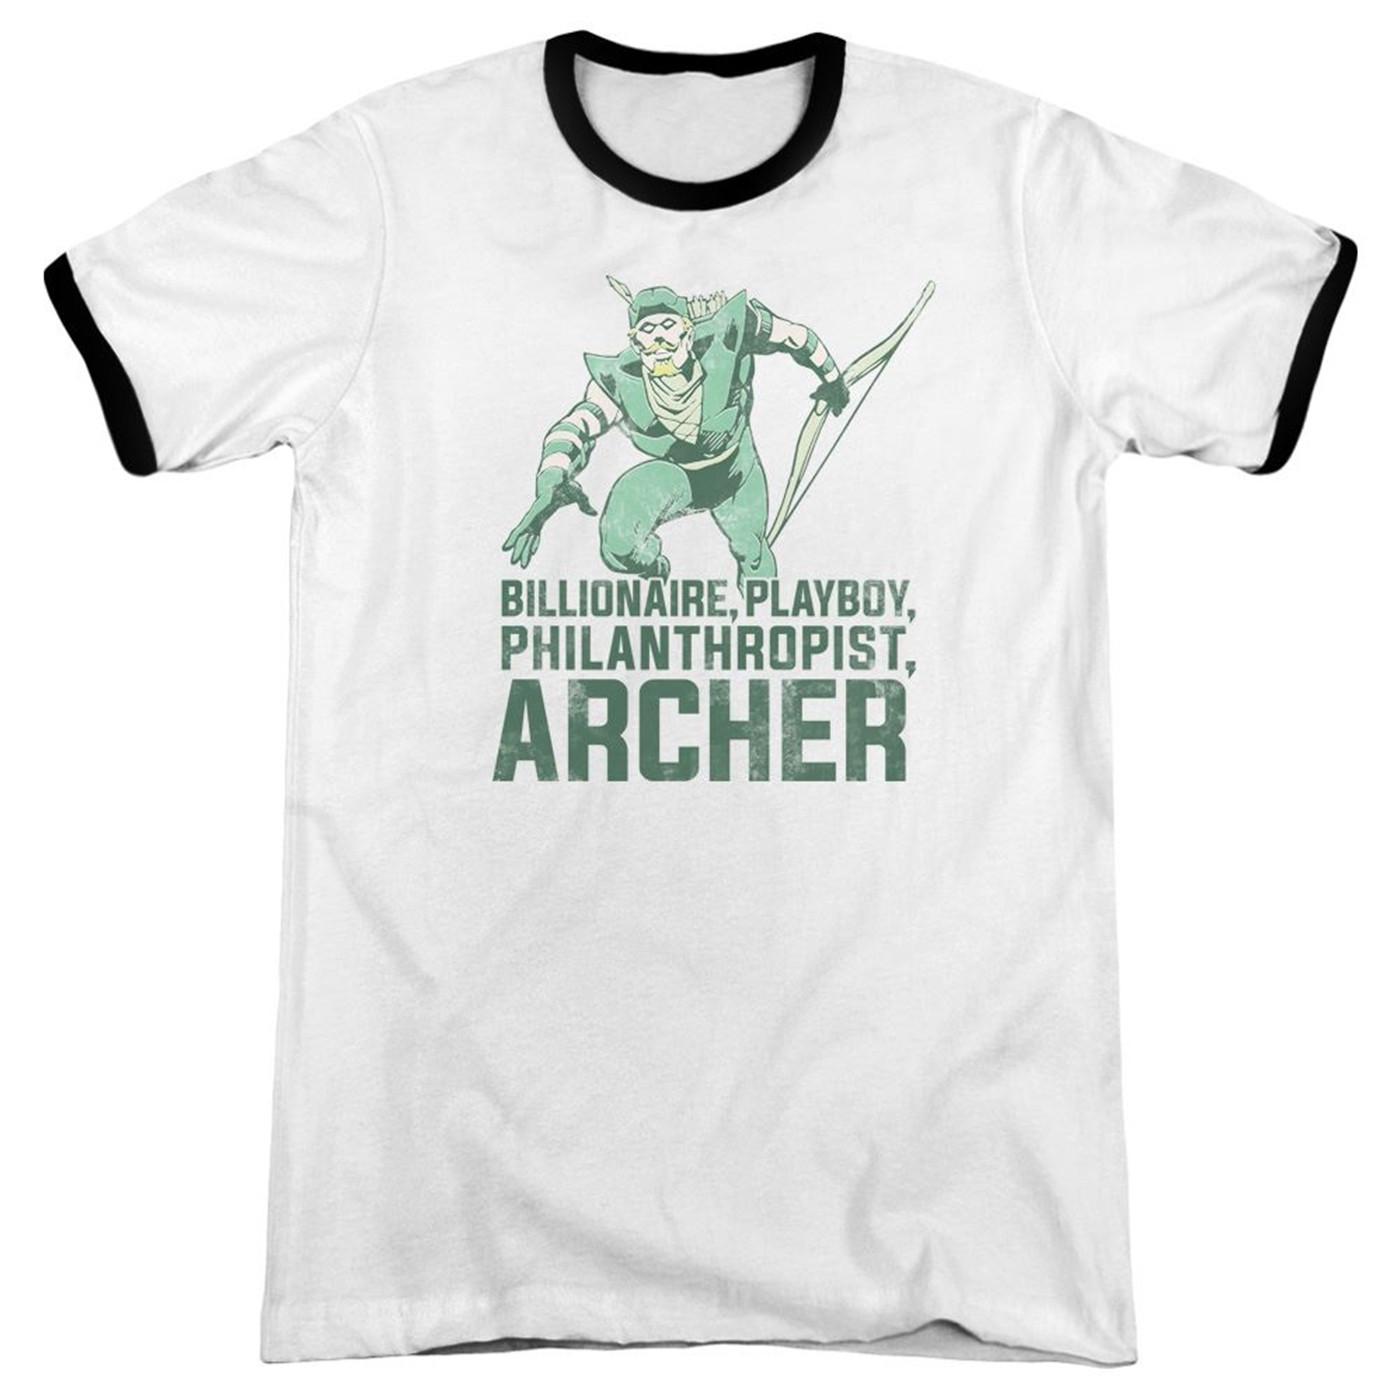 Billionaire, Playboy, Philanthropist, Archer - Green Arrow Men's Ringer Shirt